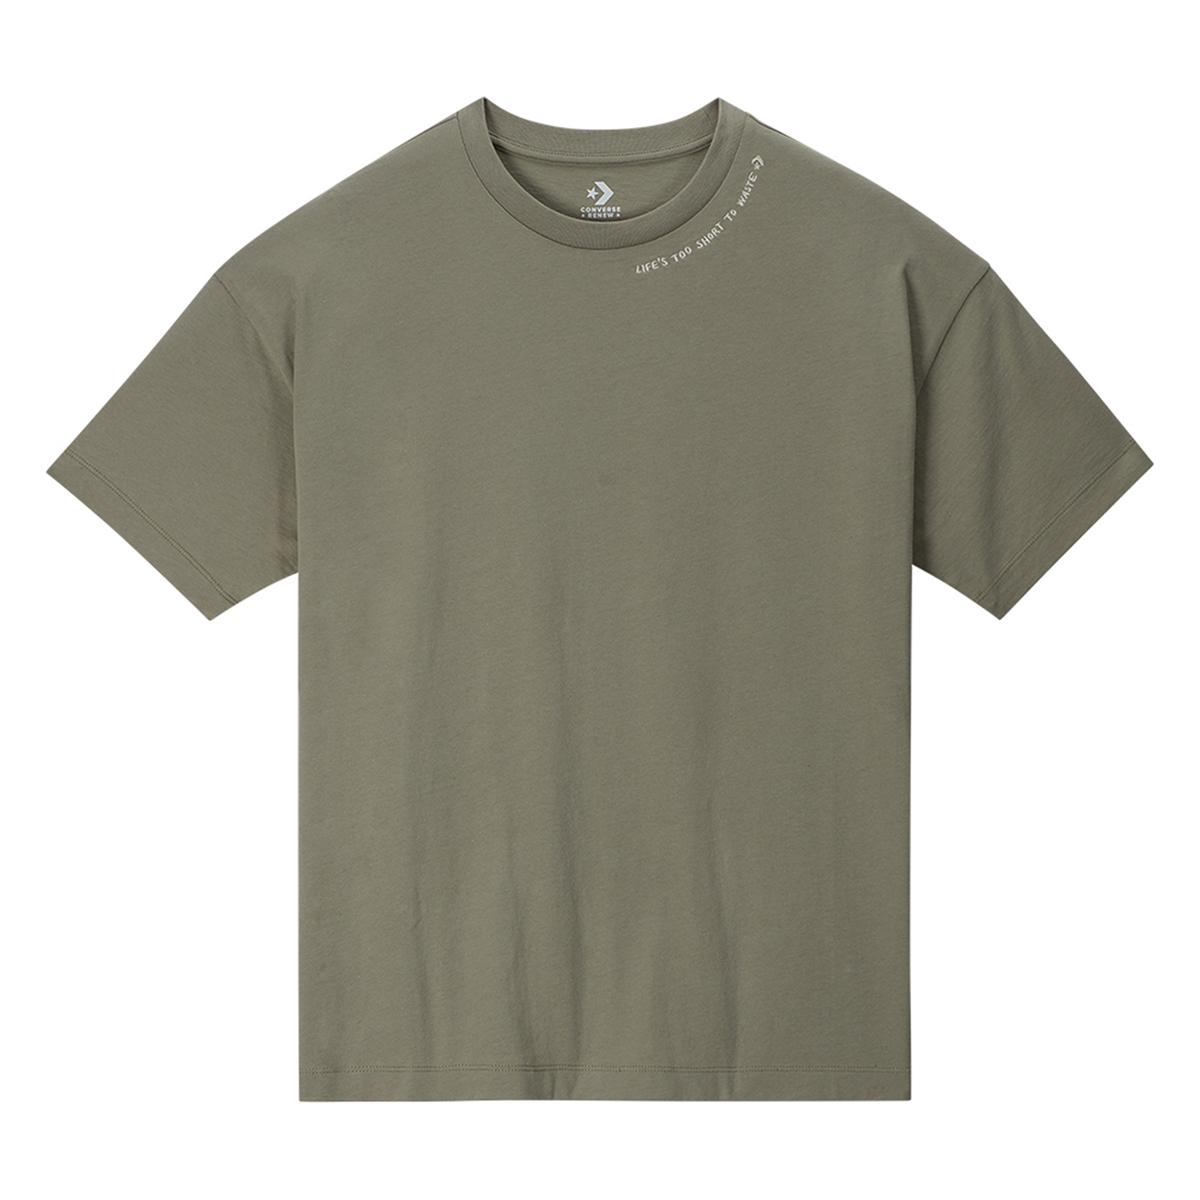 Camiseta amplia Lifes short Boxy Tee 100% algodón